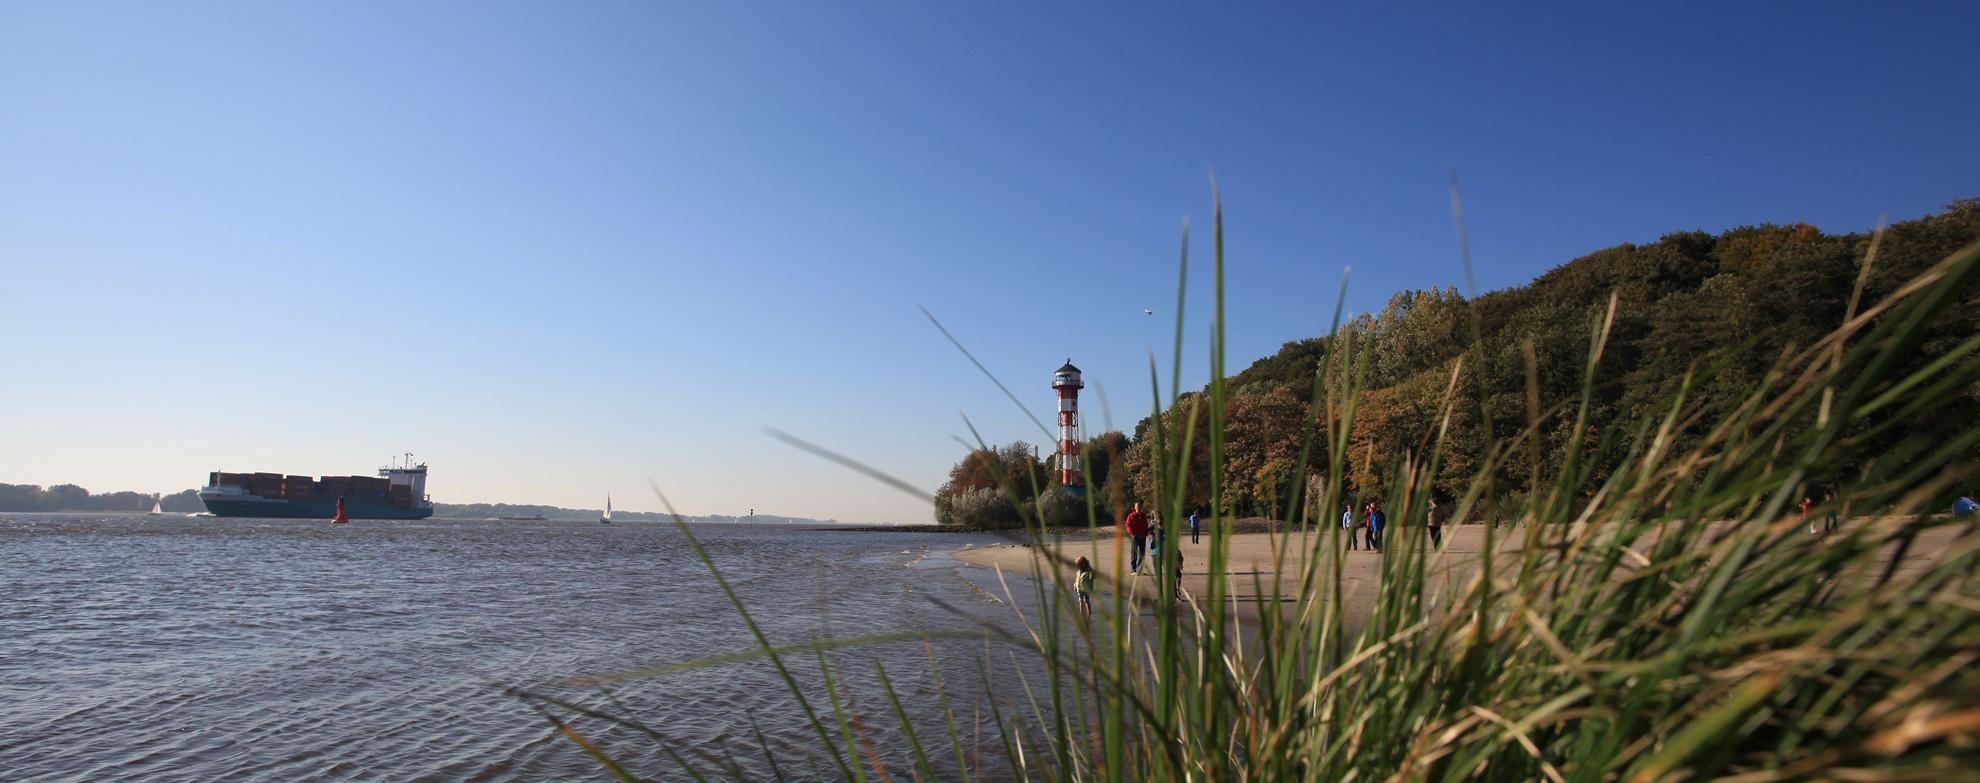 Regionalpark Wedeler Au